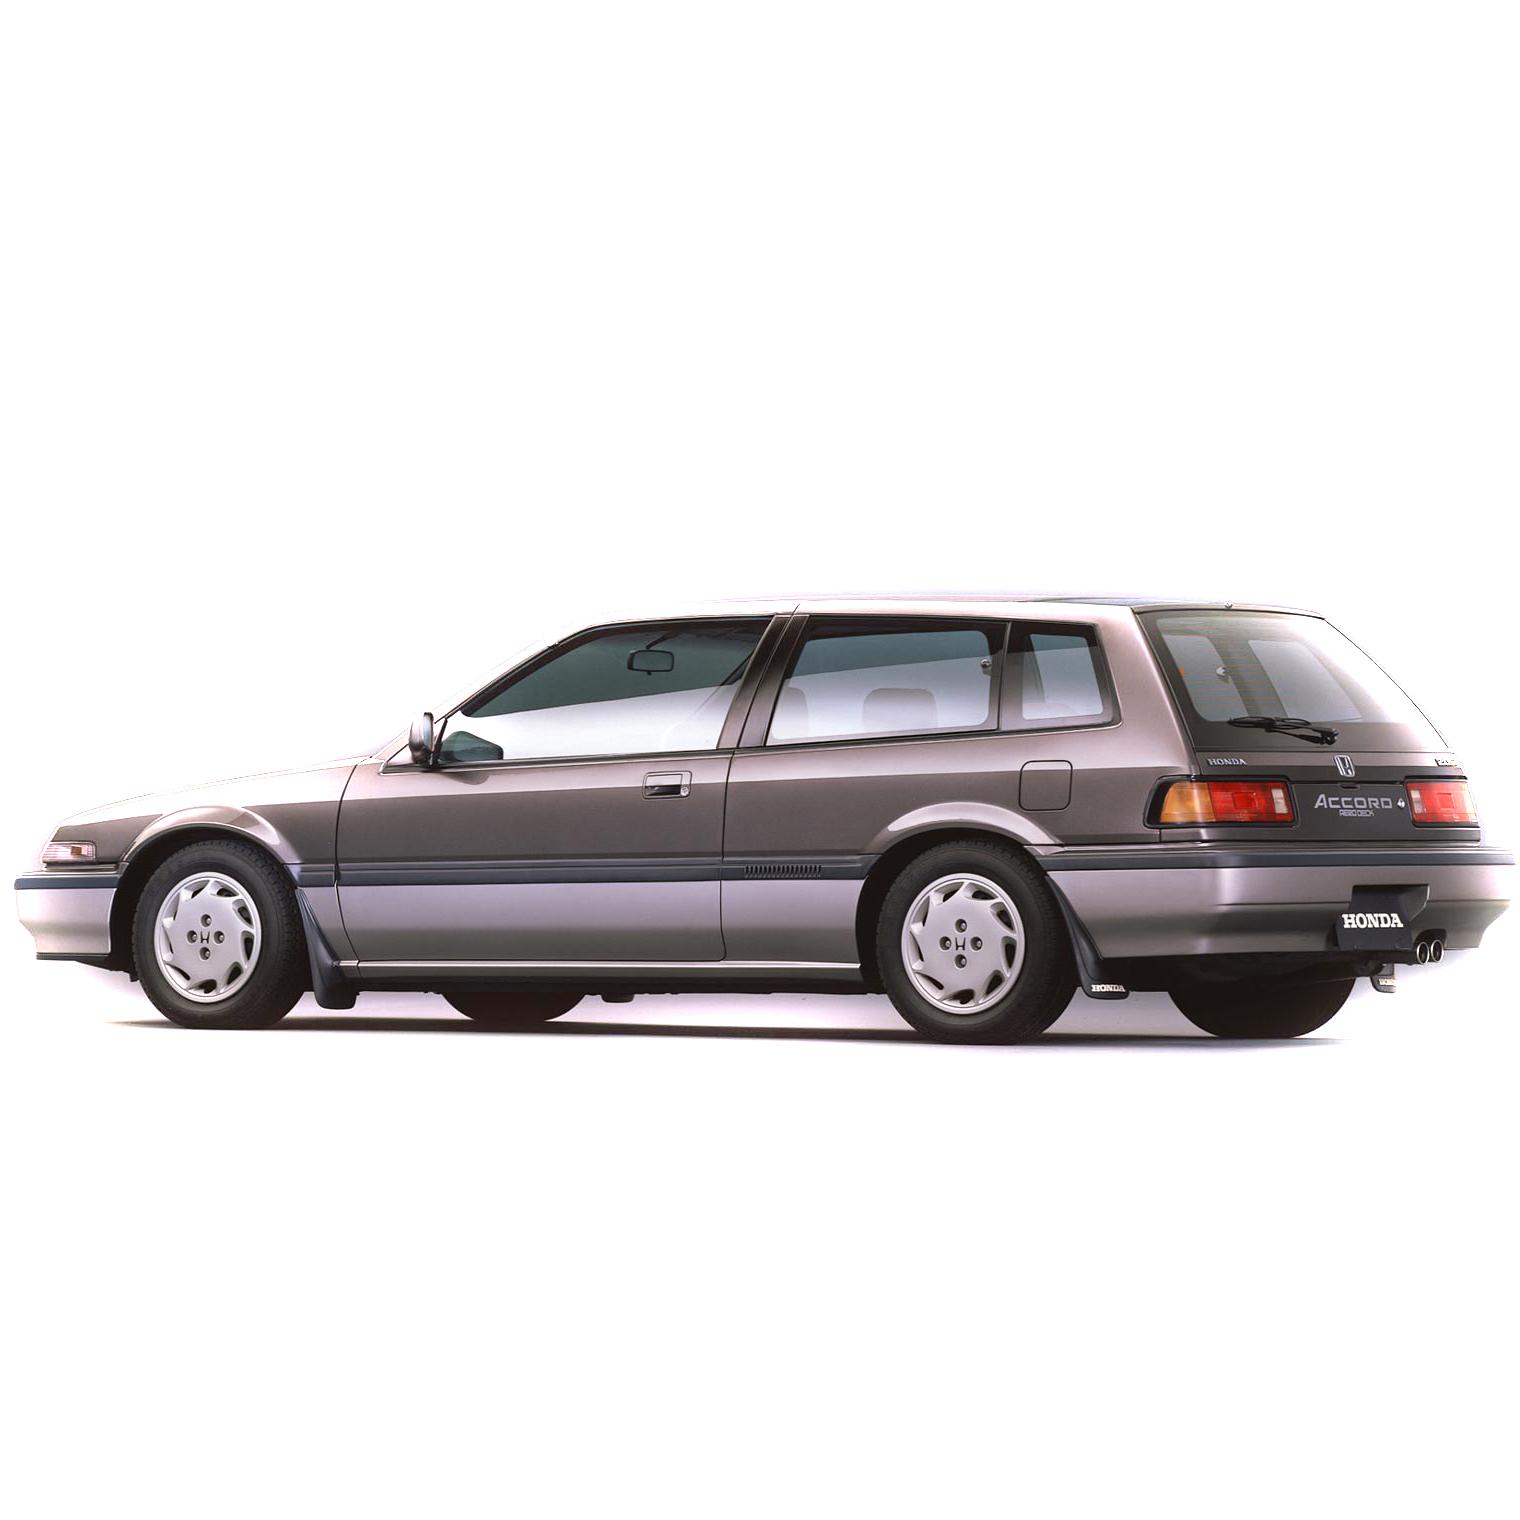 Honda Aerodeck Coupe 1989 - 1993